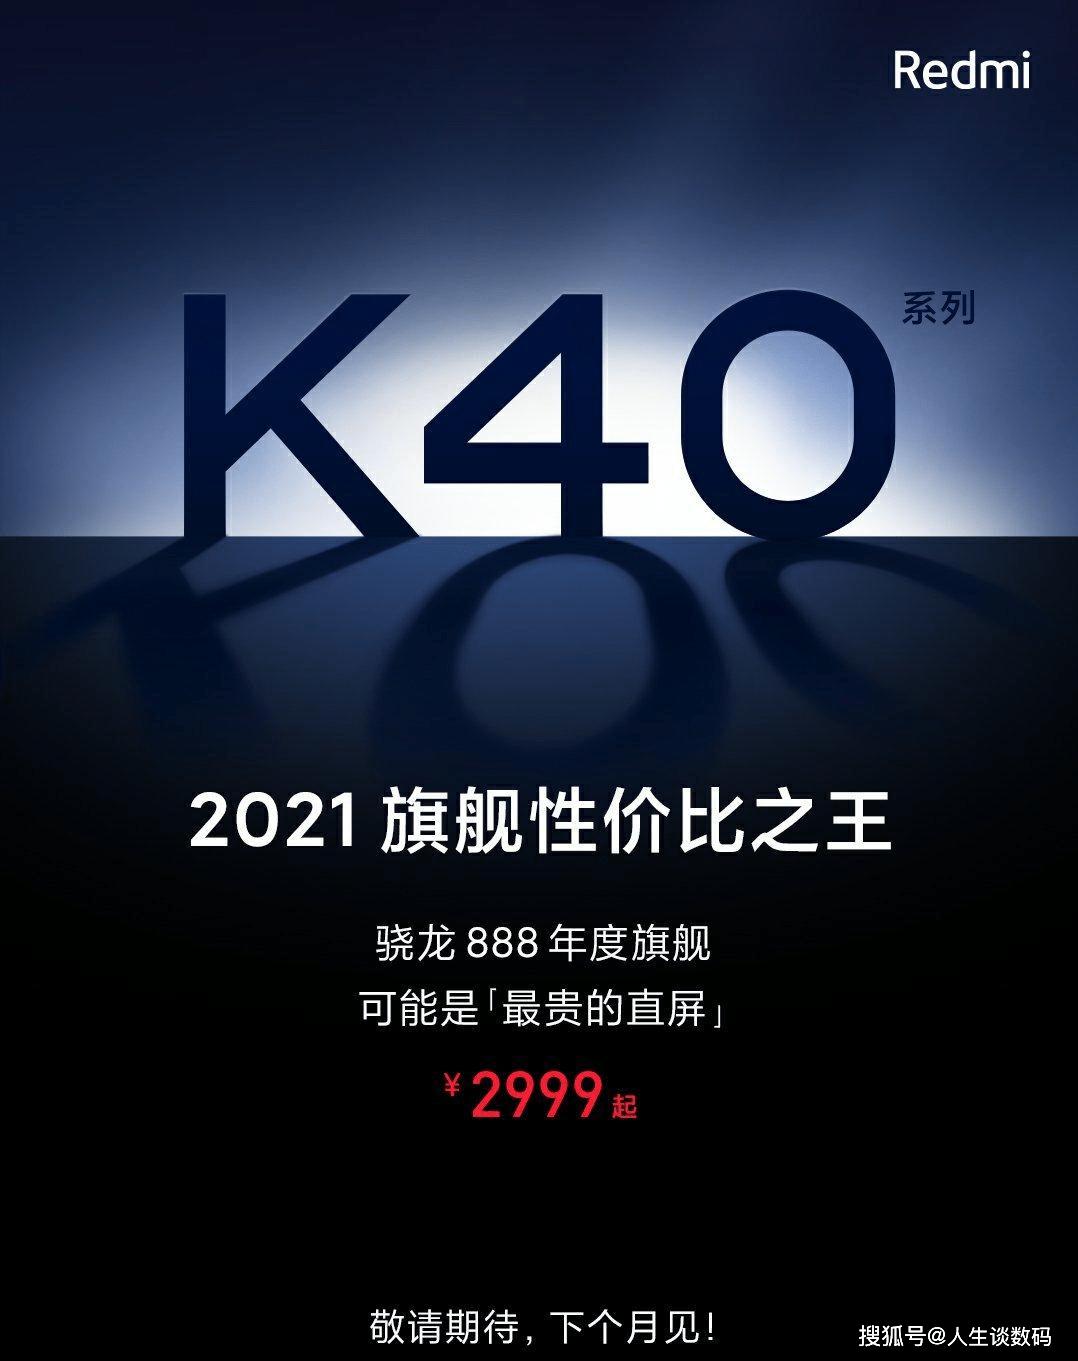 "K40想做""很贵直屏"",这是噱头还是硬实力?让人充满期待"